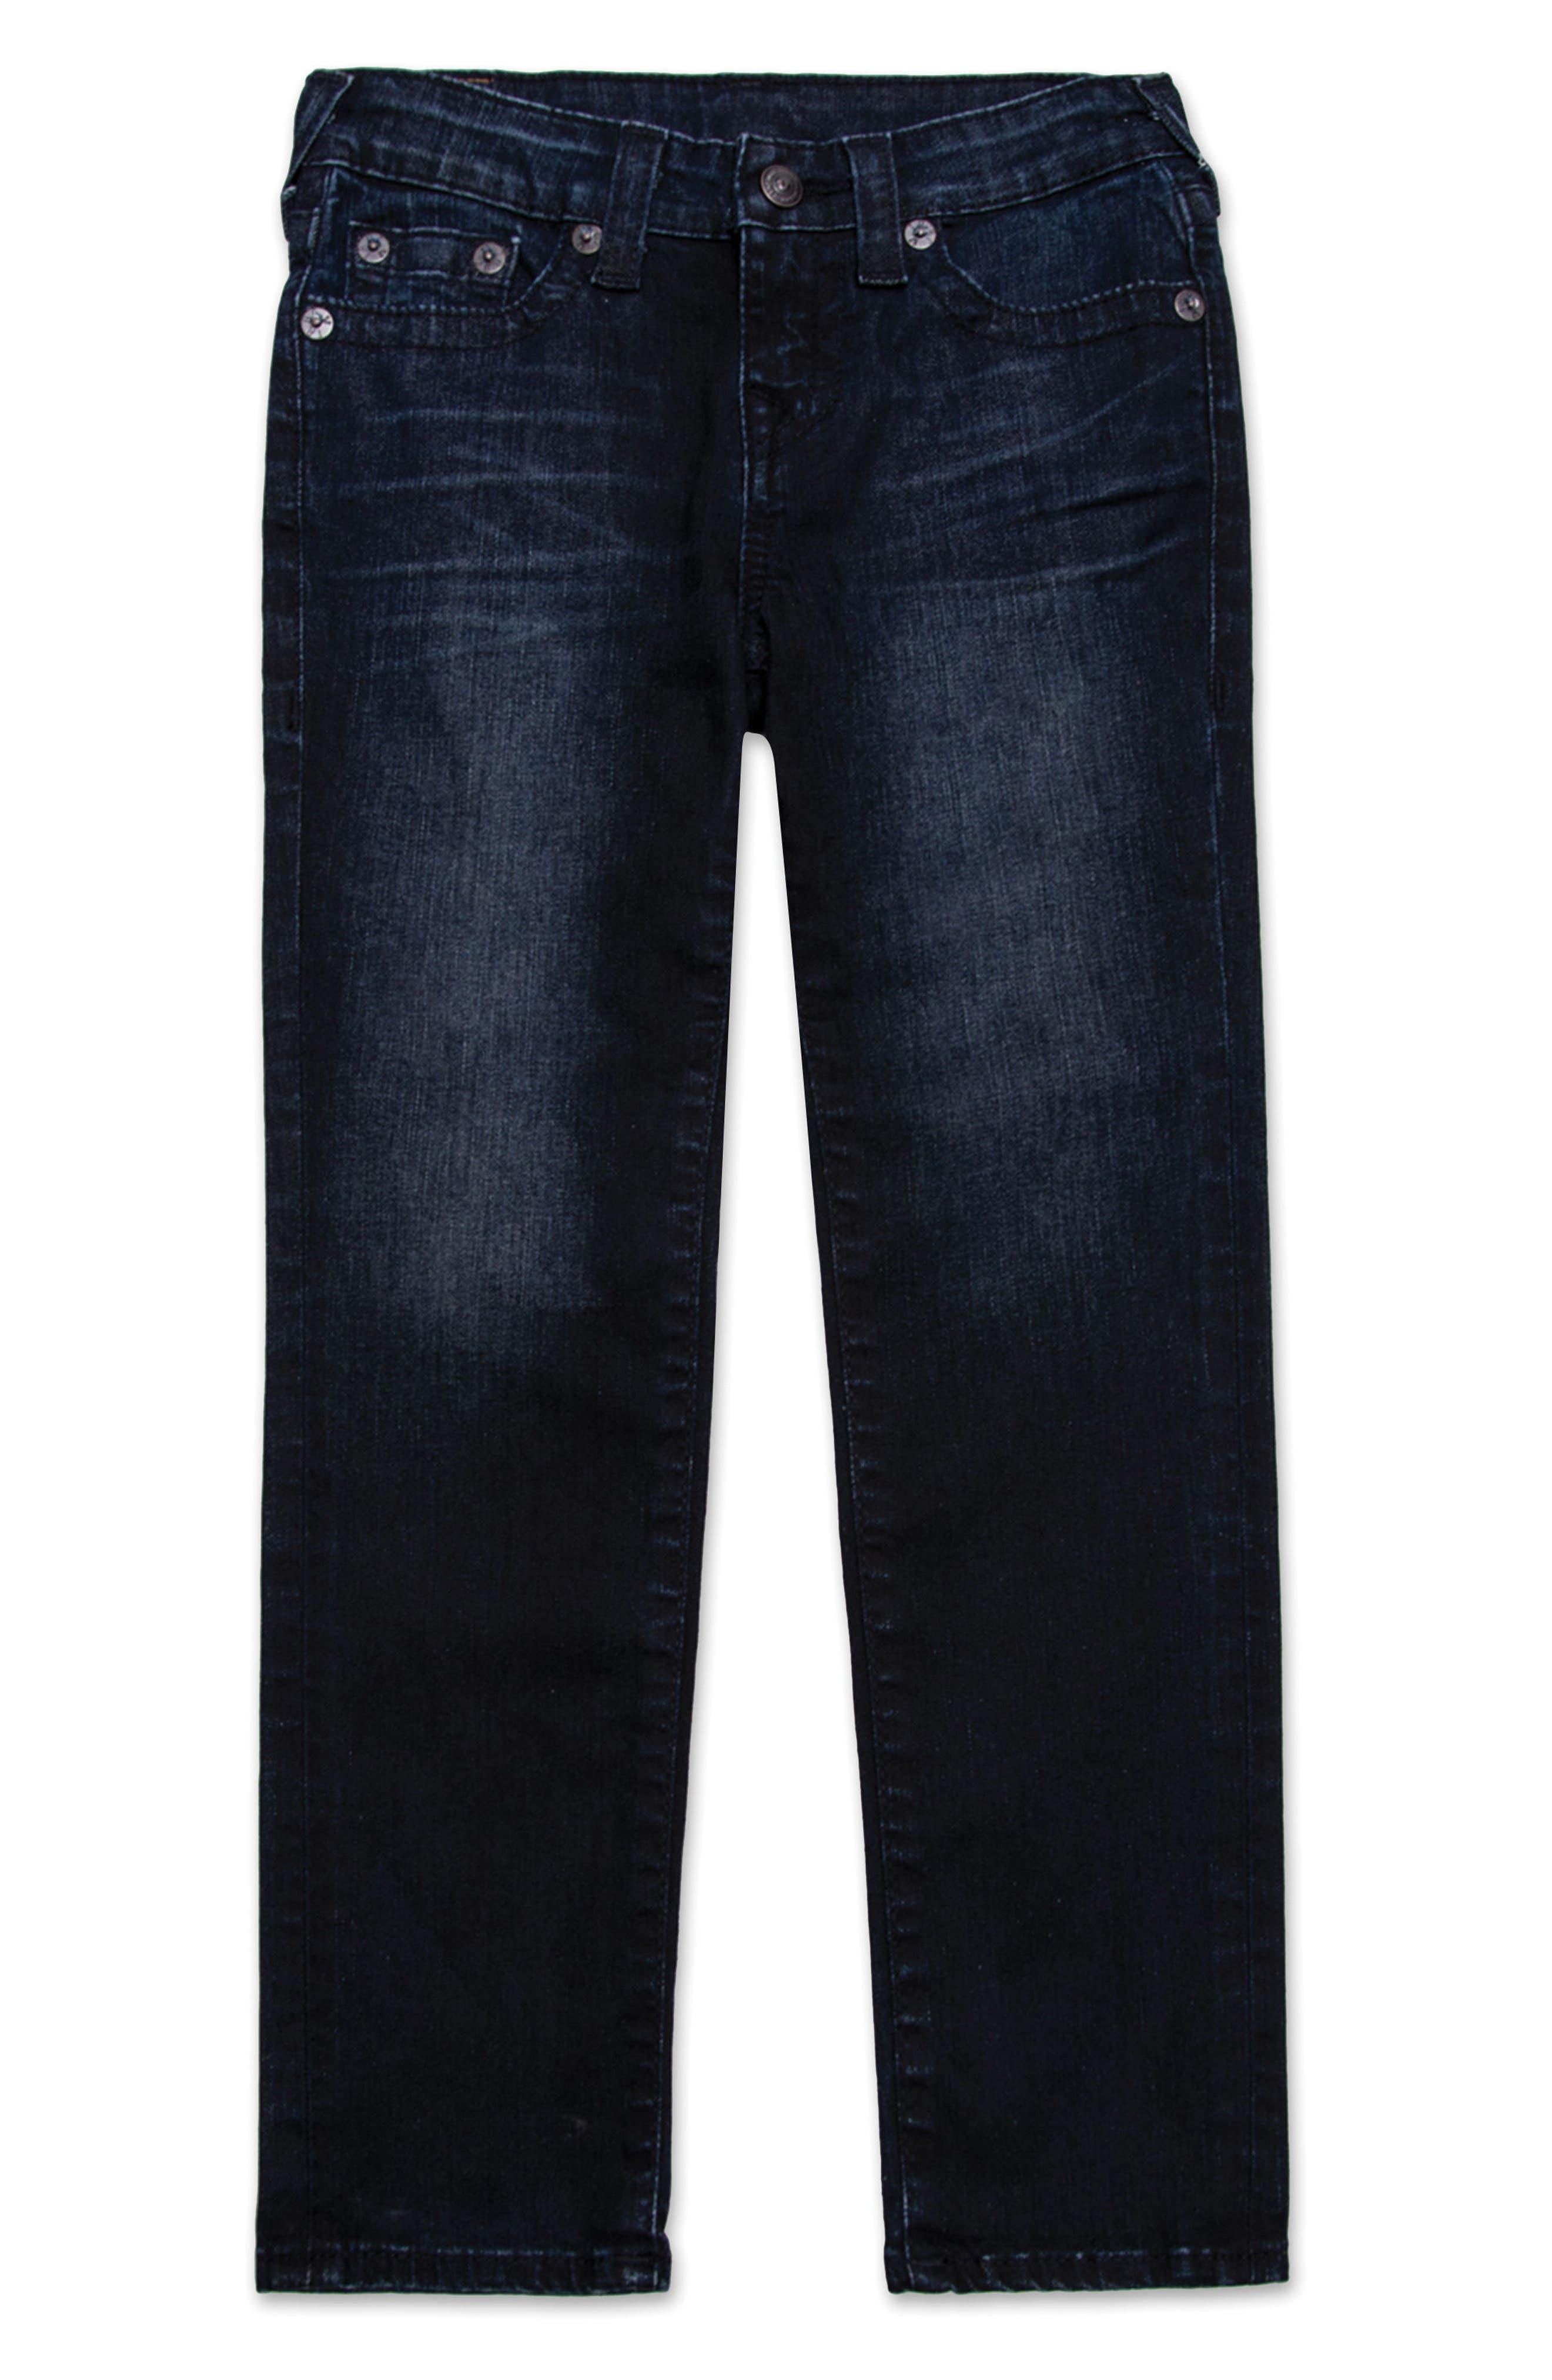 True Religion Brand Jeans Geno Single End Straight Leg Jeans (Toddler Boys & Little Boys)